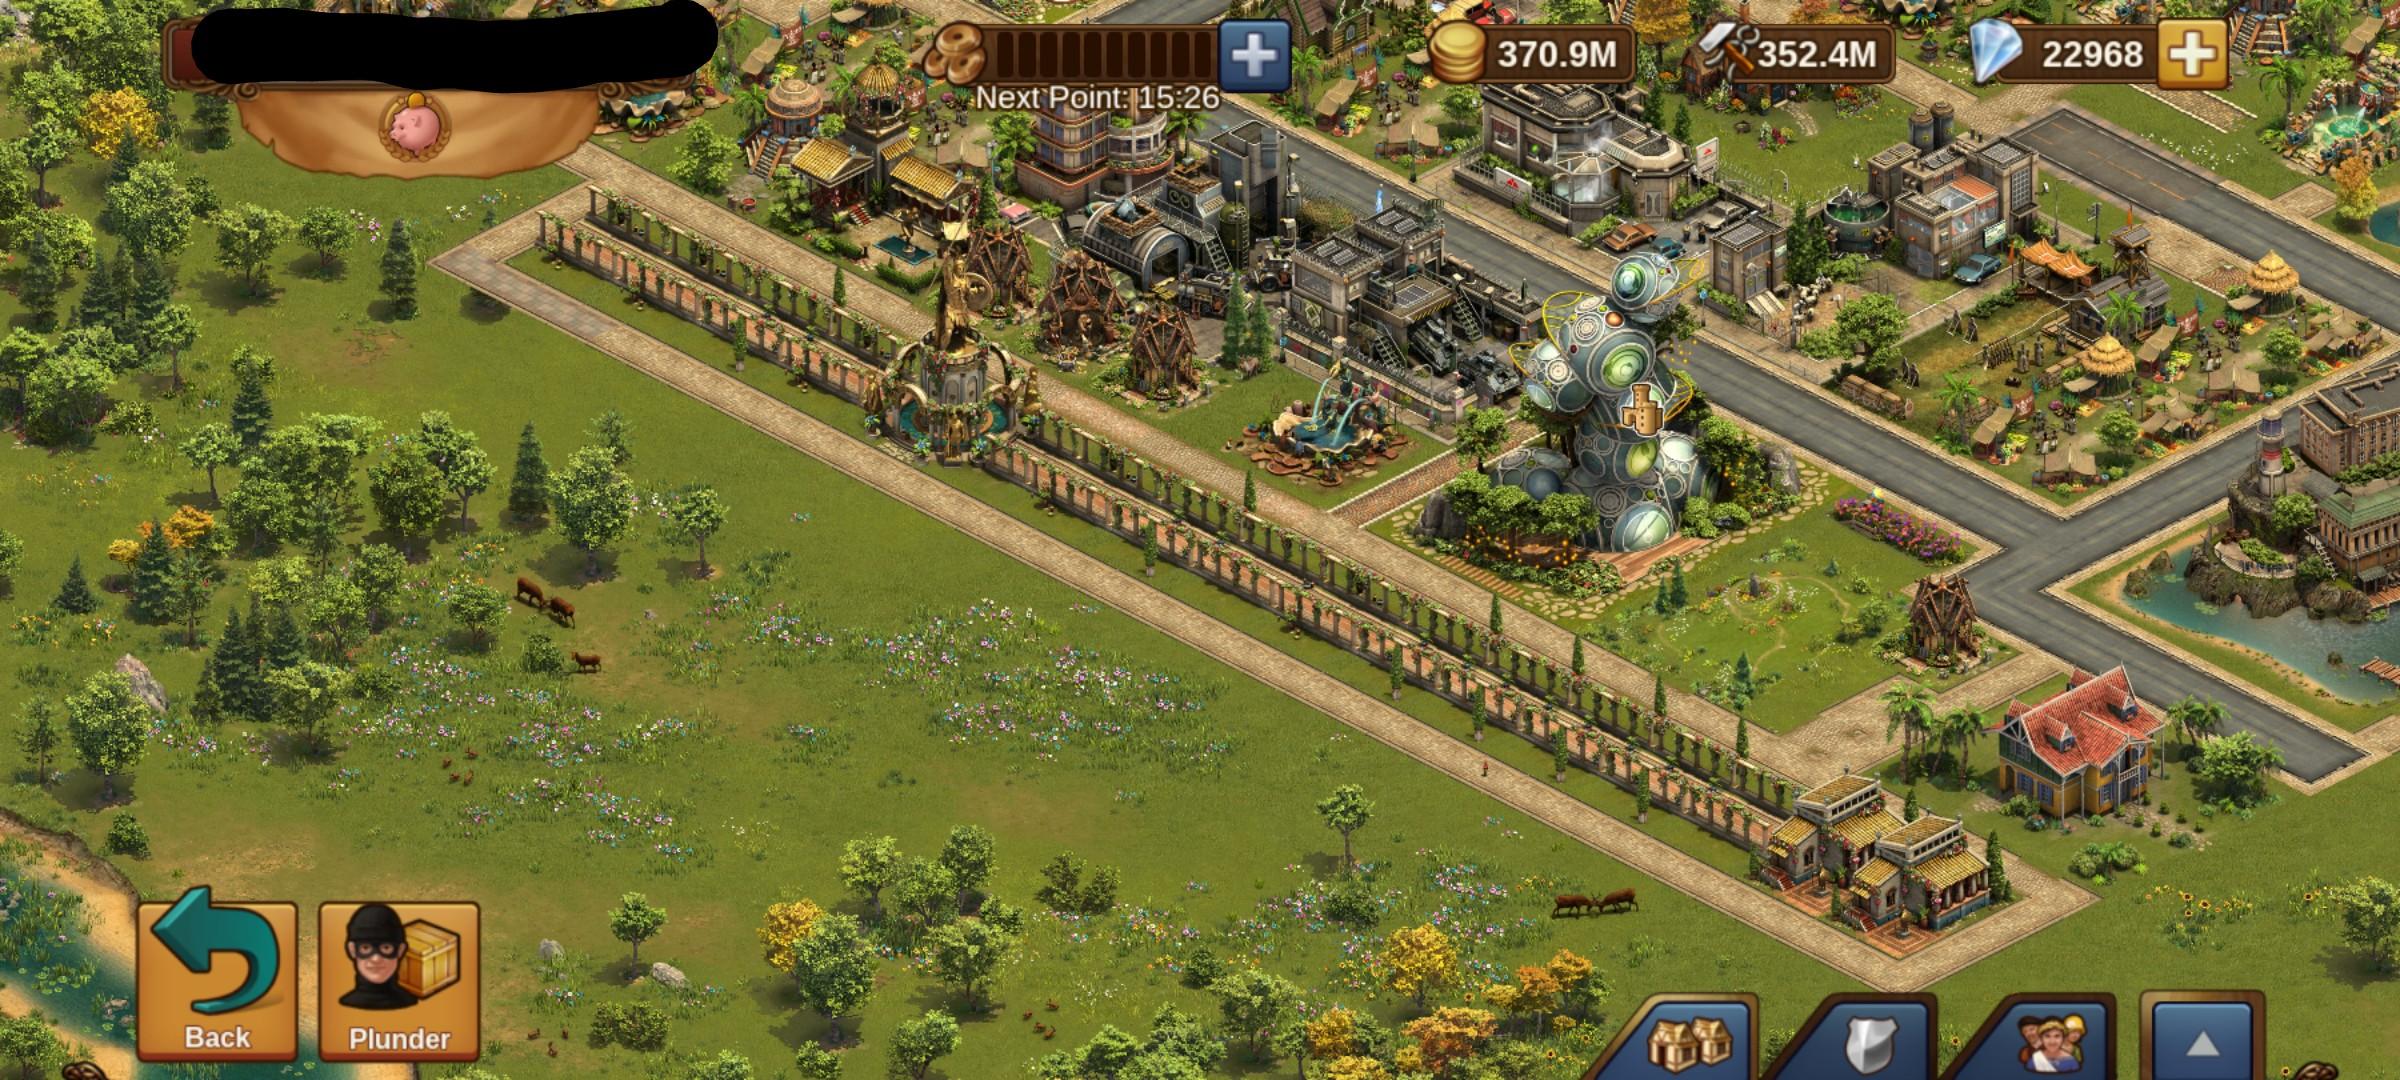 Screenshot_20210628-215022_Forge of Empires~2.jpg